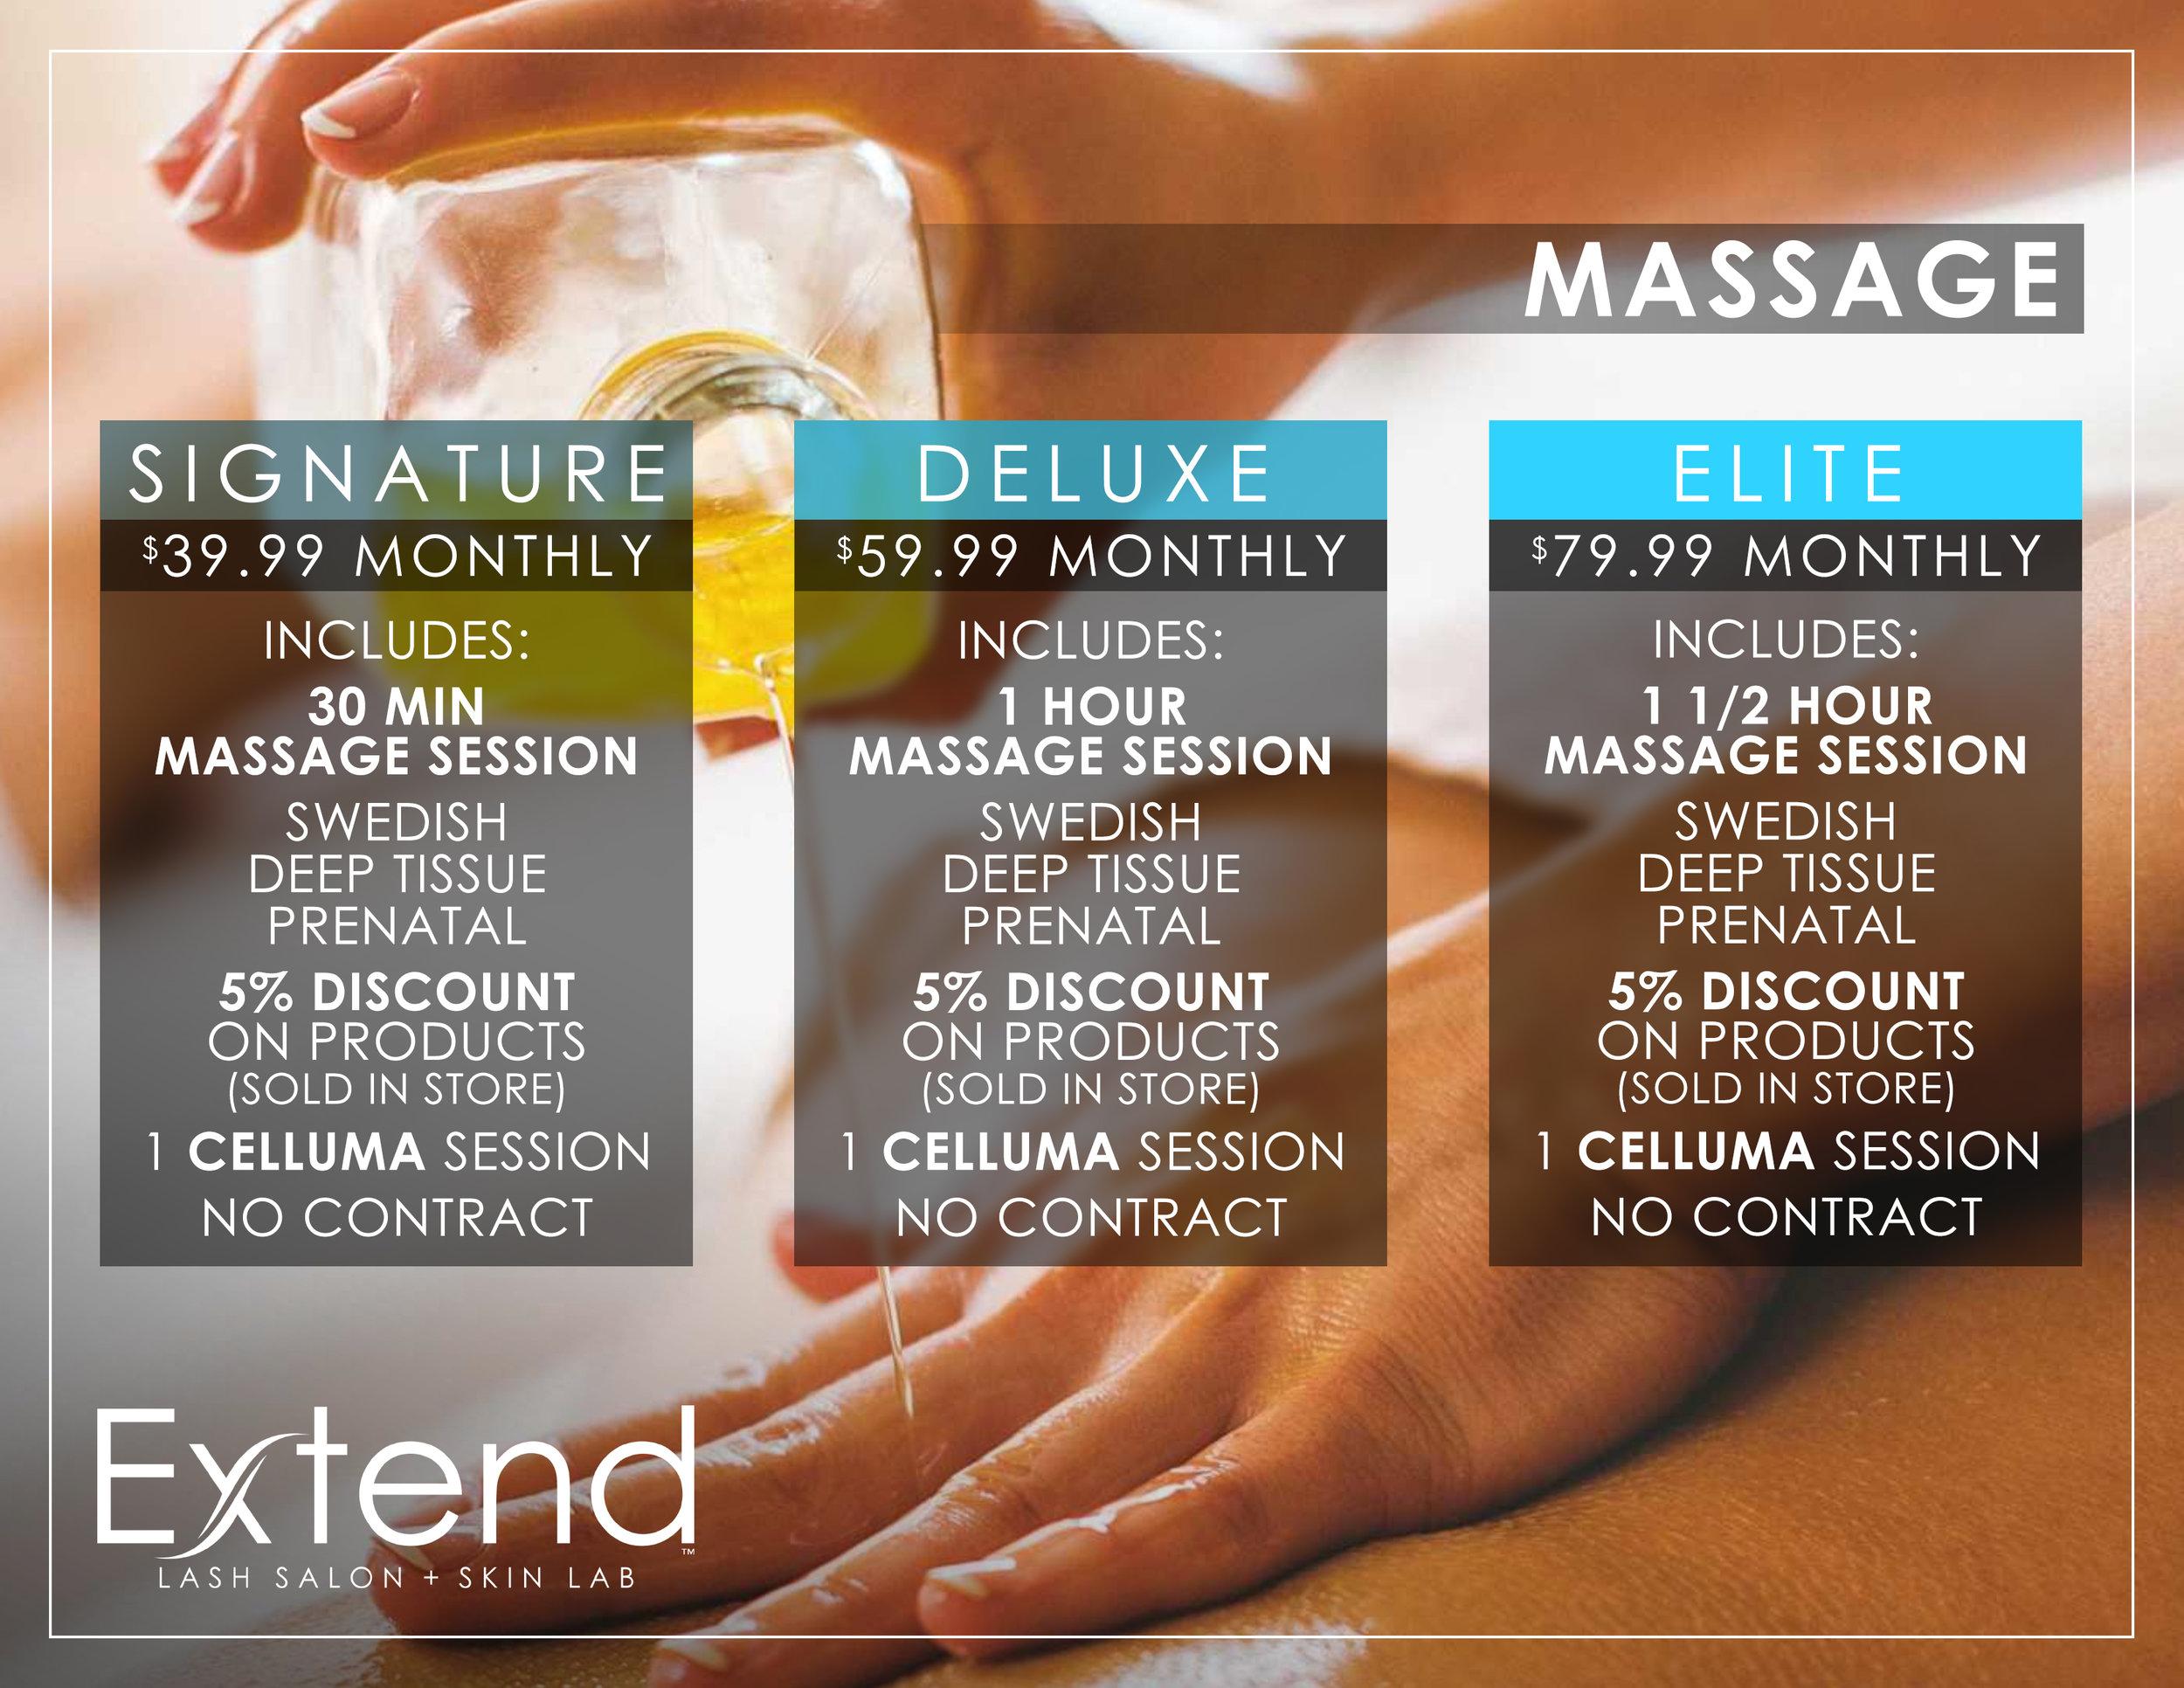 Extend Lash Salon - Massage Page.jpg